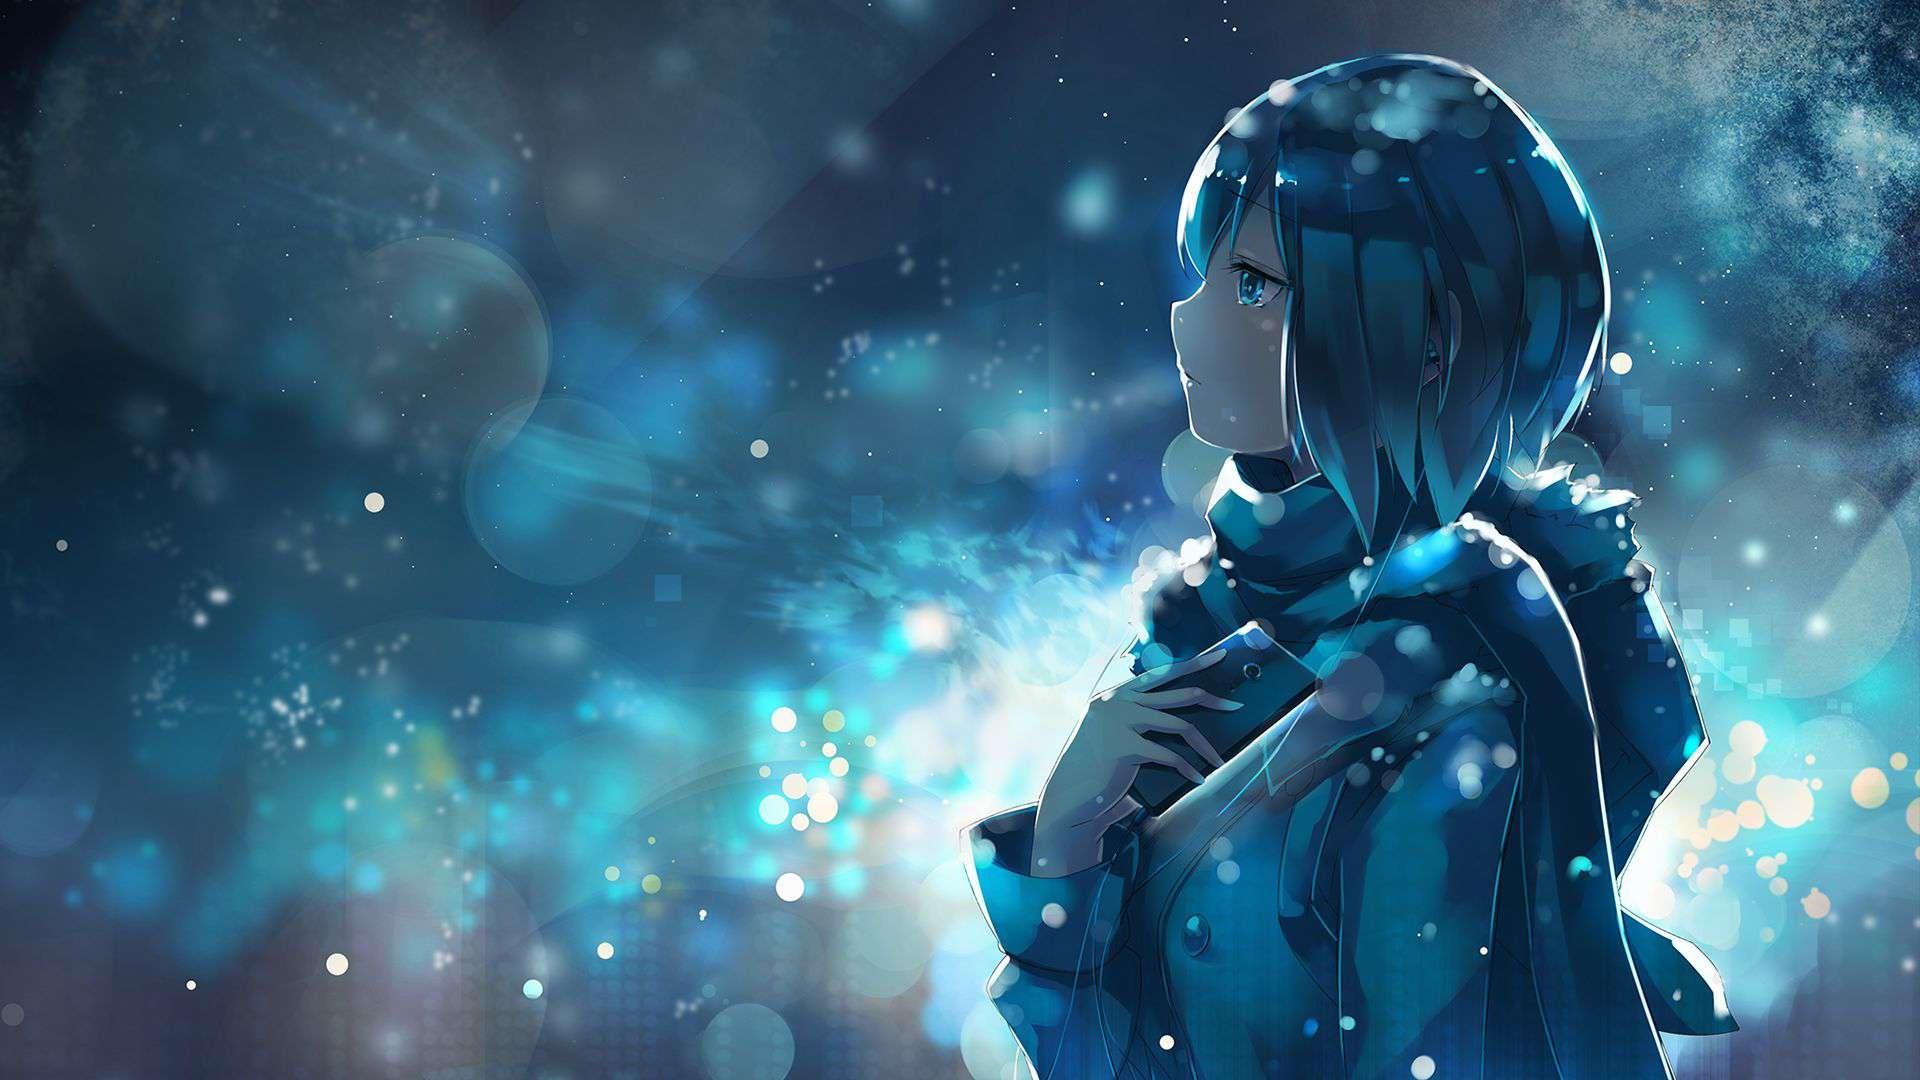 Beautiful Anime Wallpaper Hd , HD Wallpaper & Backgrounds